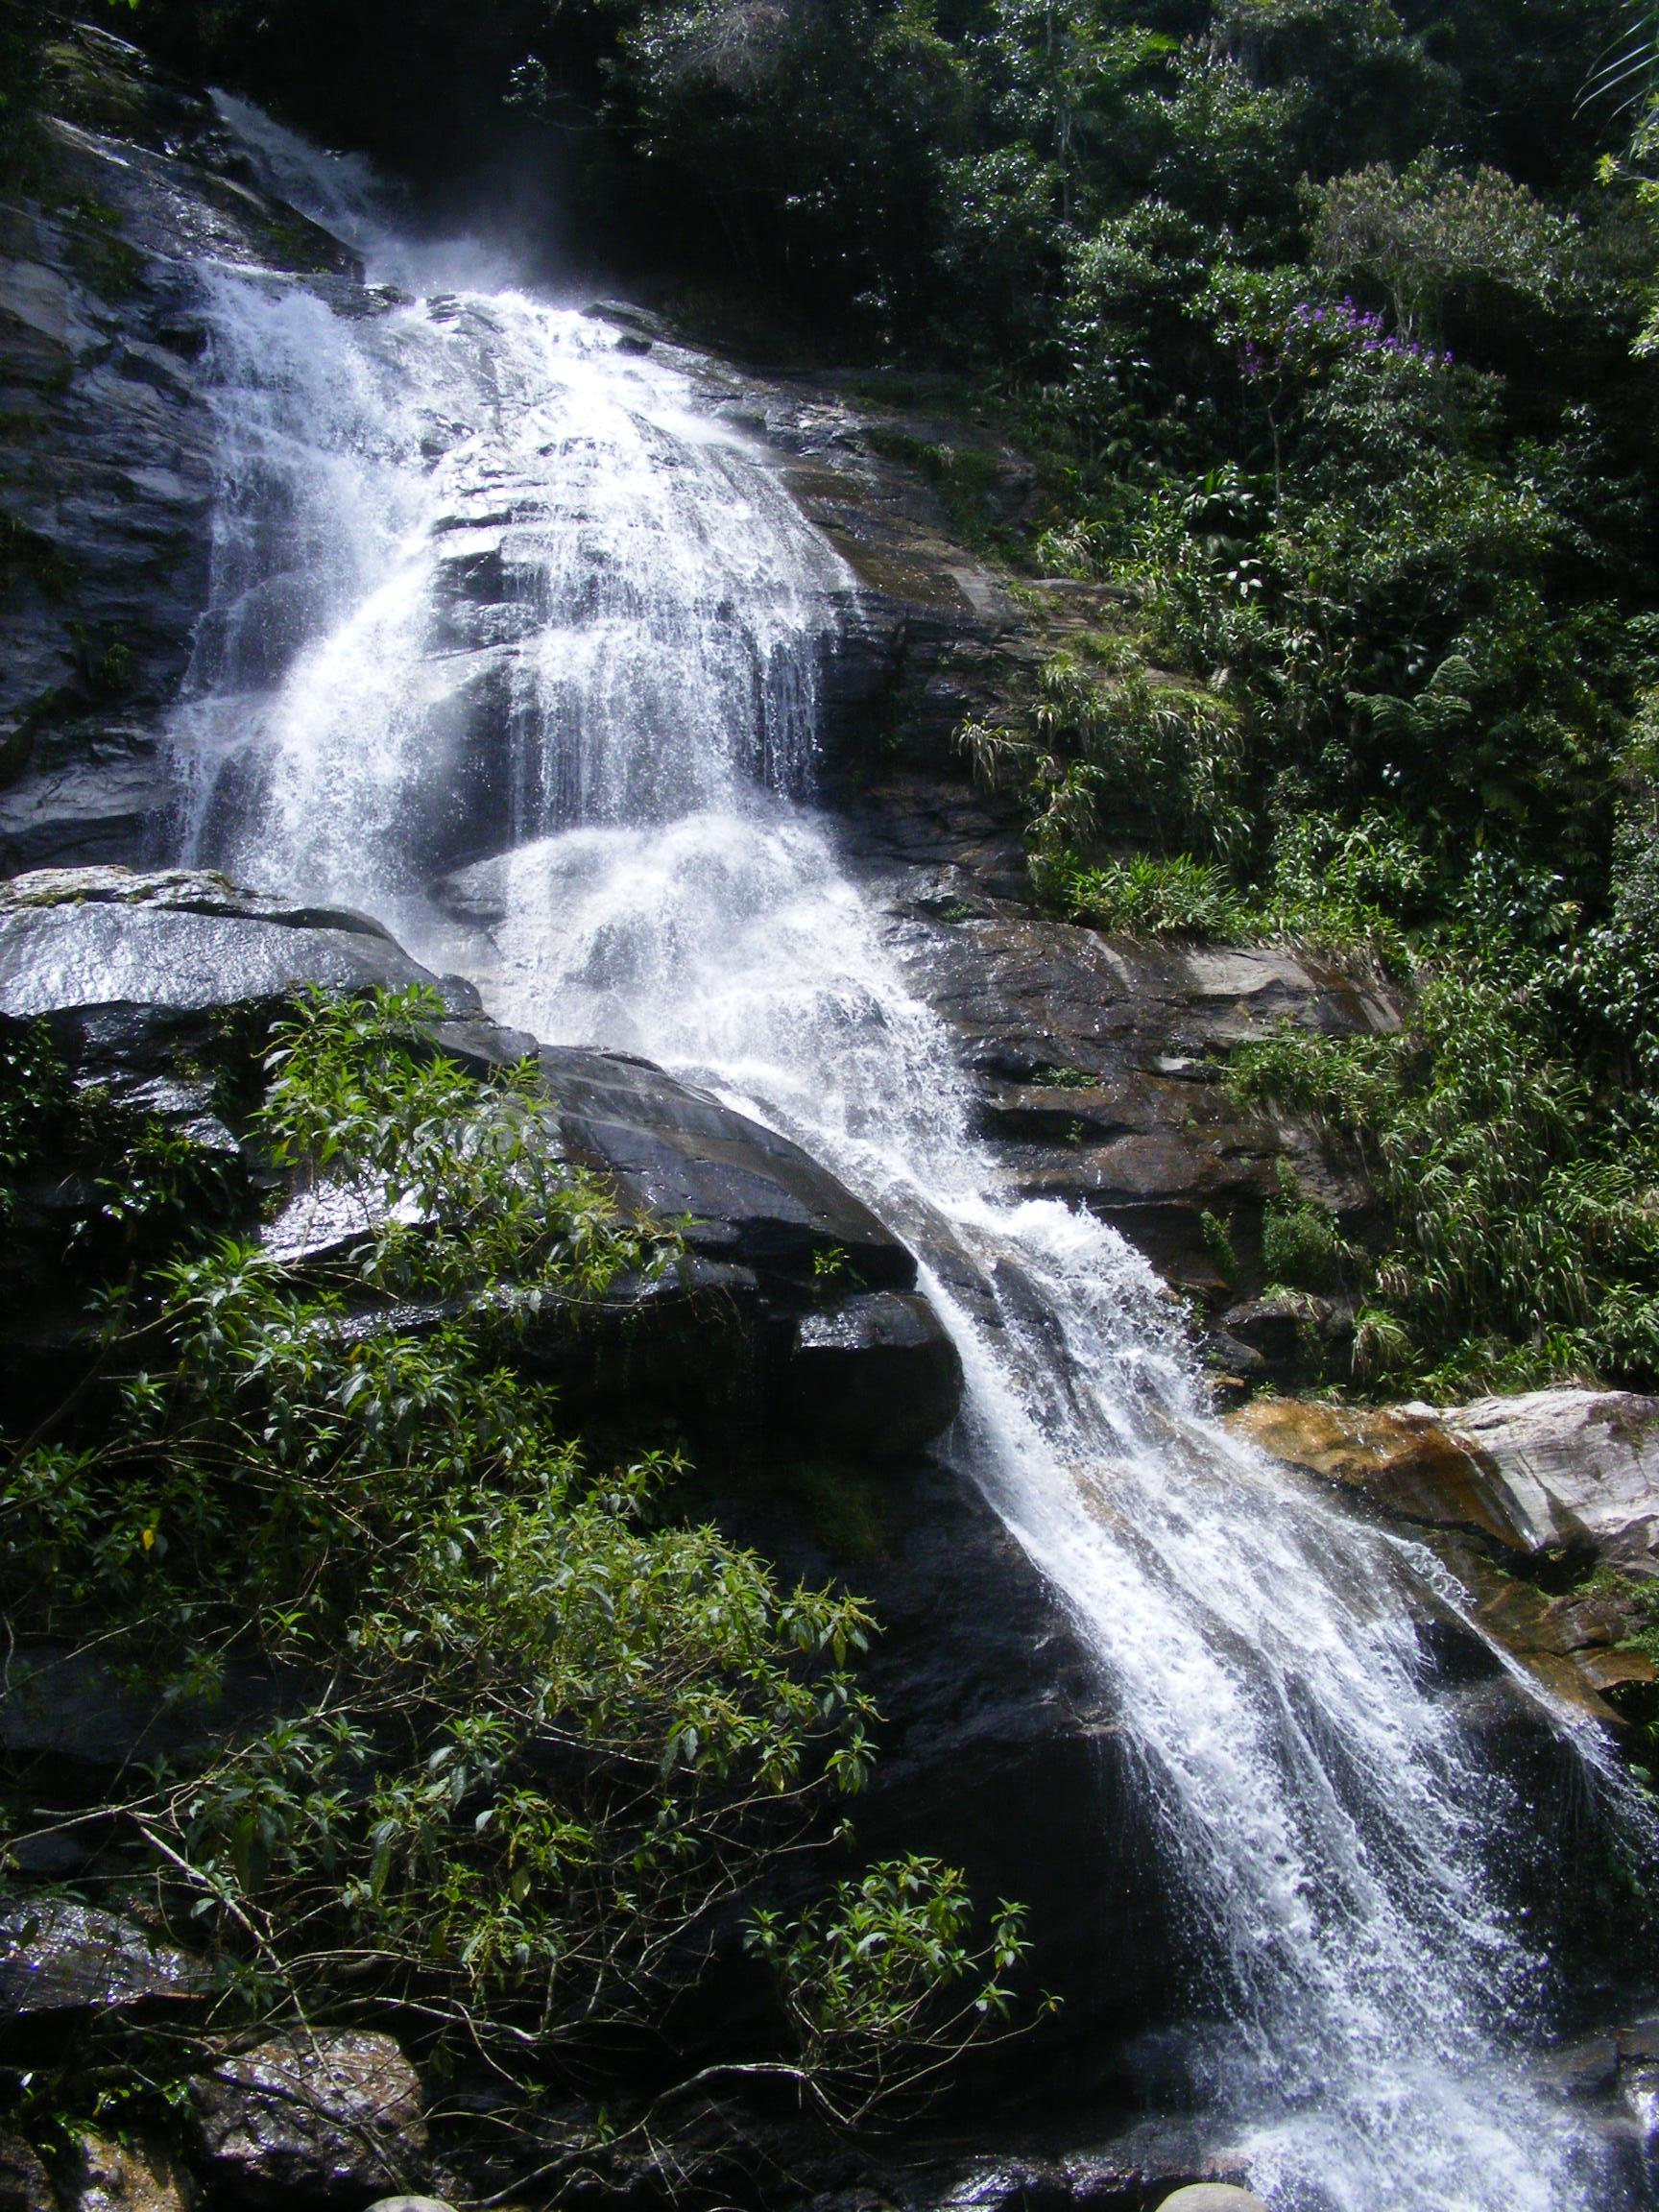 Ficheiro:Cachoeira - Floresta da Tijuca, Rio de Janeiro ...